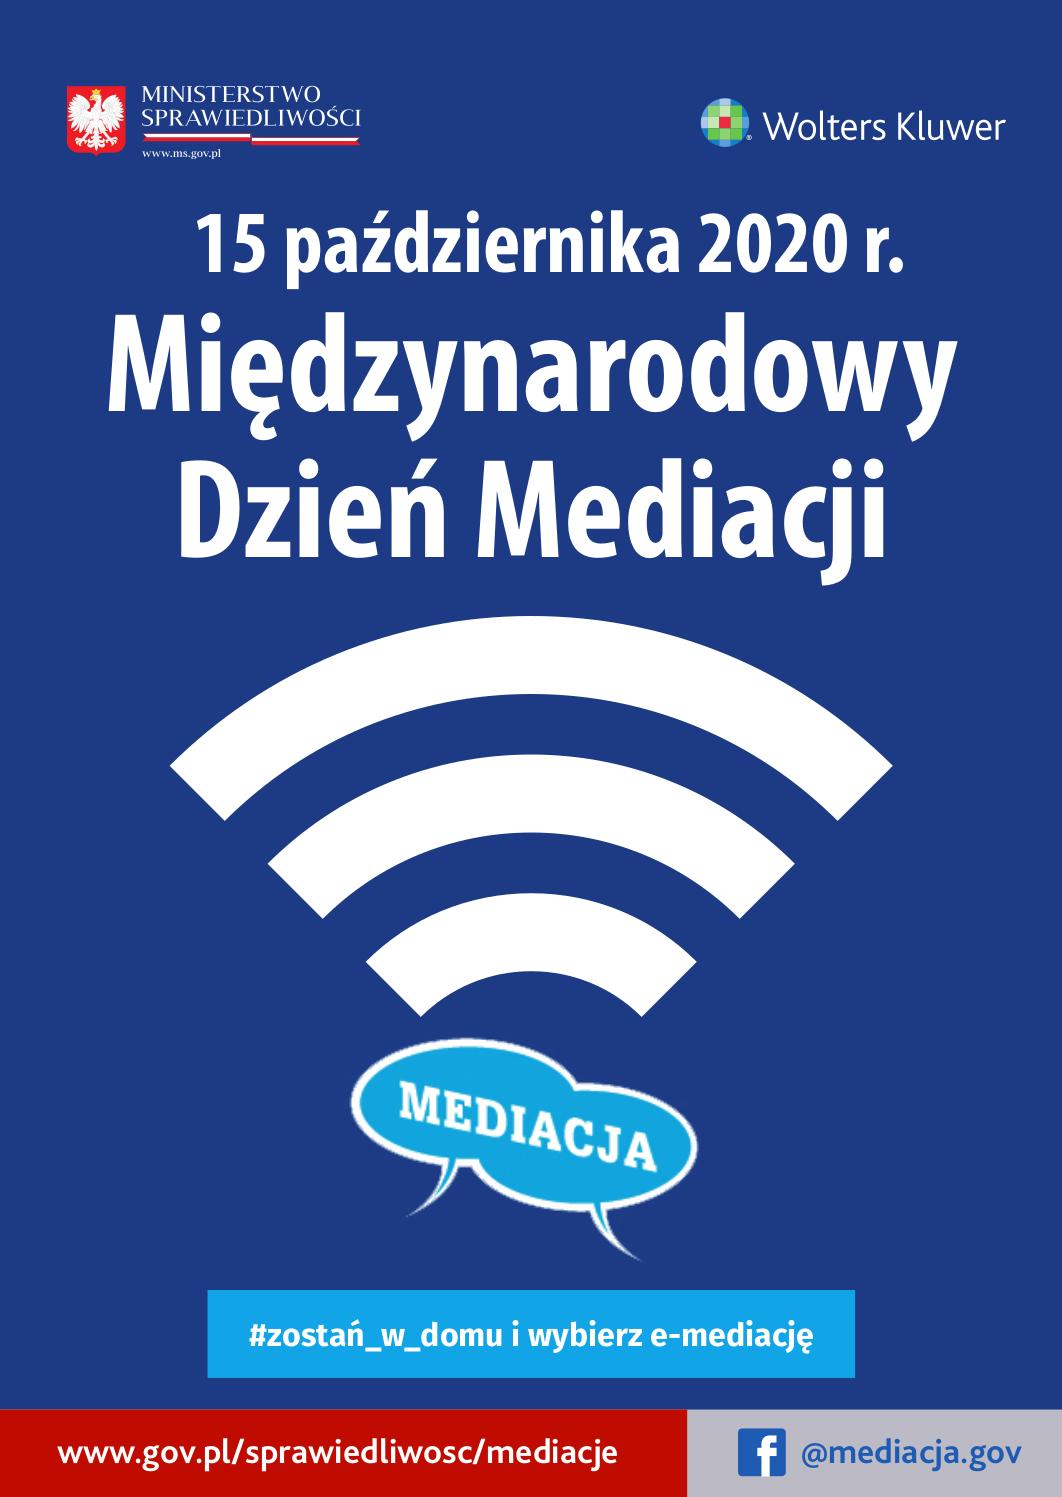 ulotka_MDM_2020_01